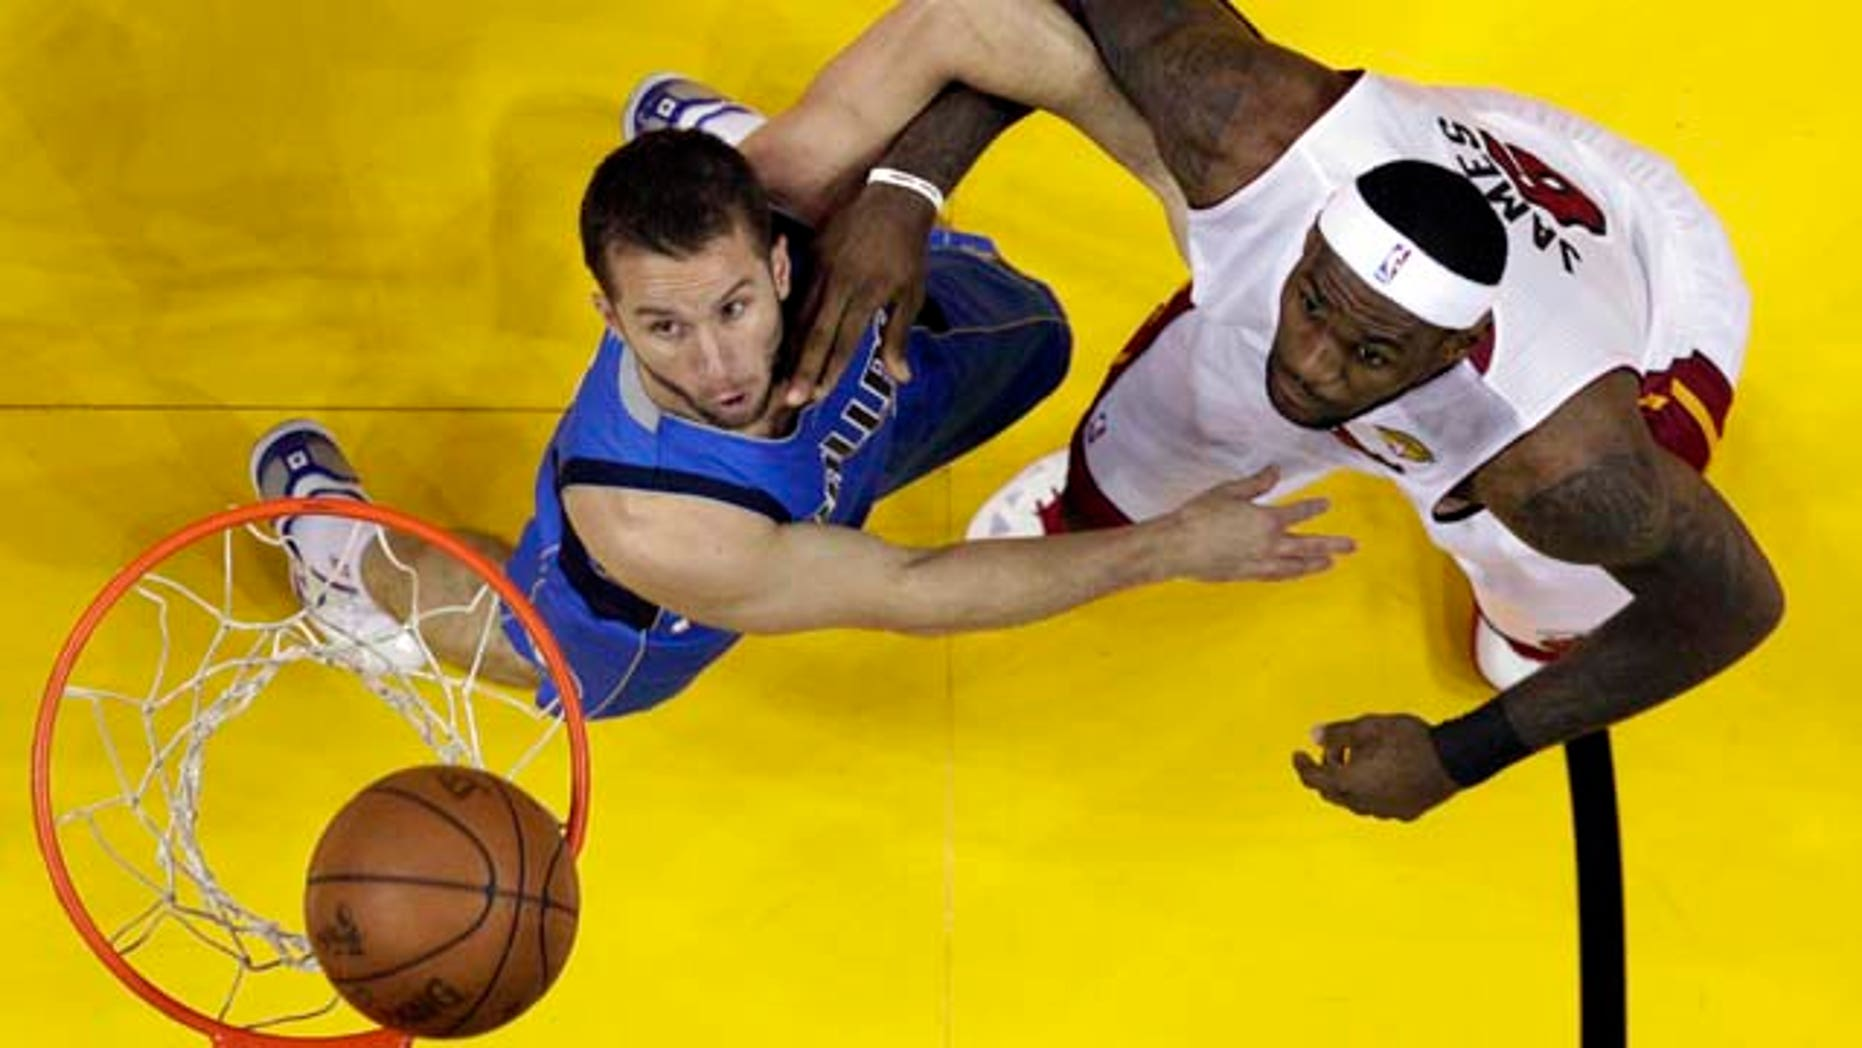 baab5e4af749d Miami Heat's LeBron James (6) and Dallas Mavericks' Jose Juan Barea battle  for